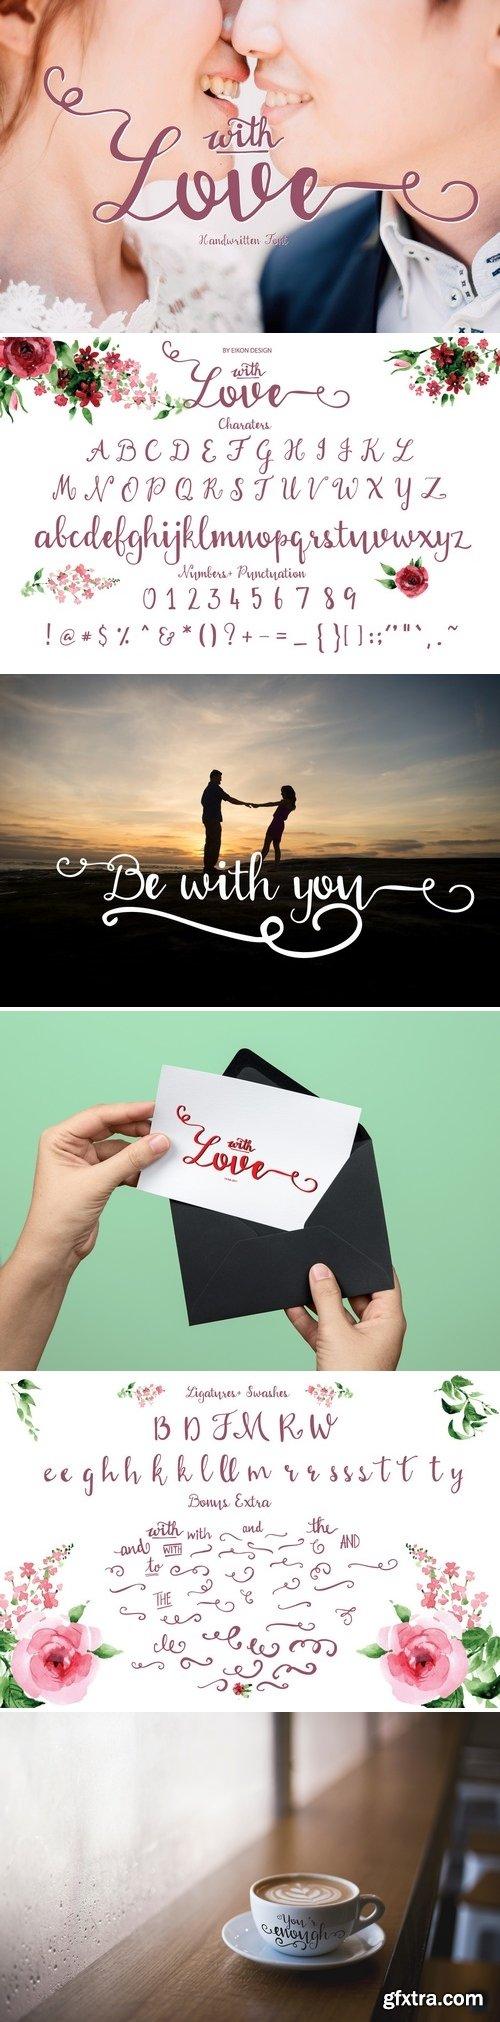 FontBundles - With love Handwritten font 13934